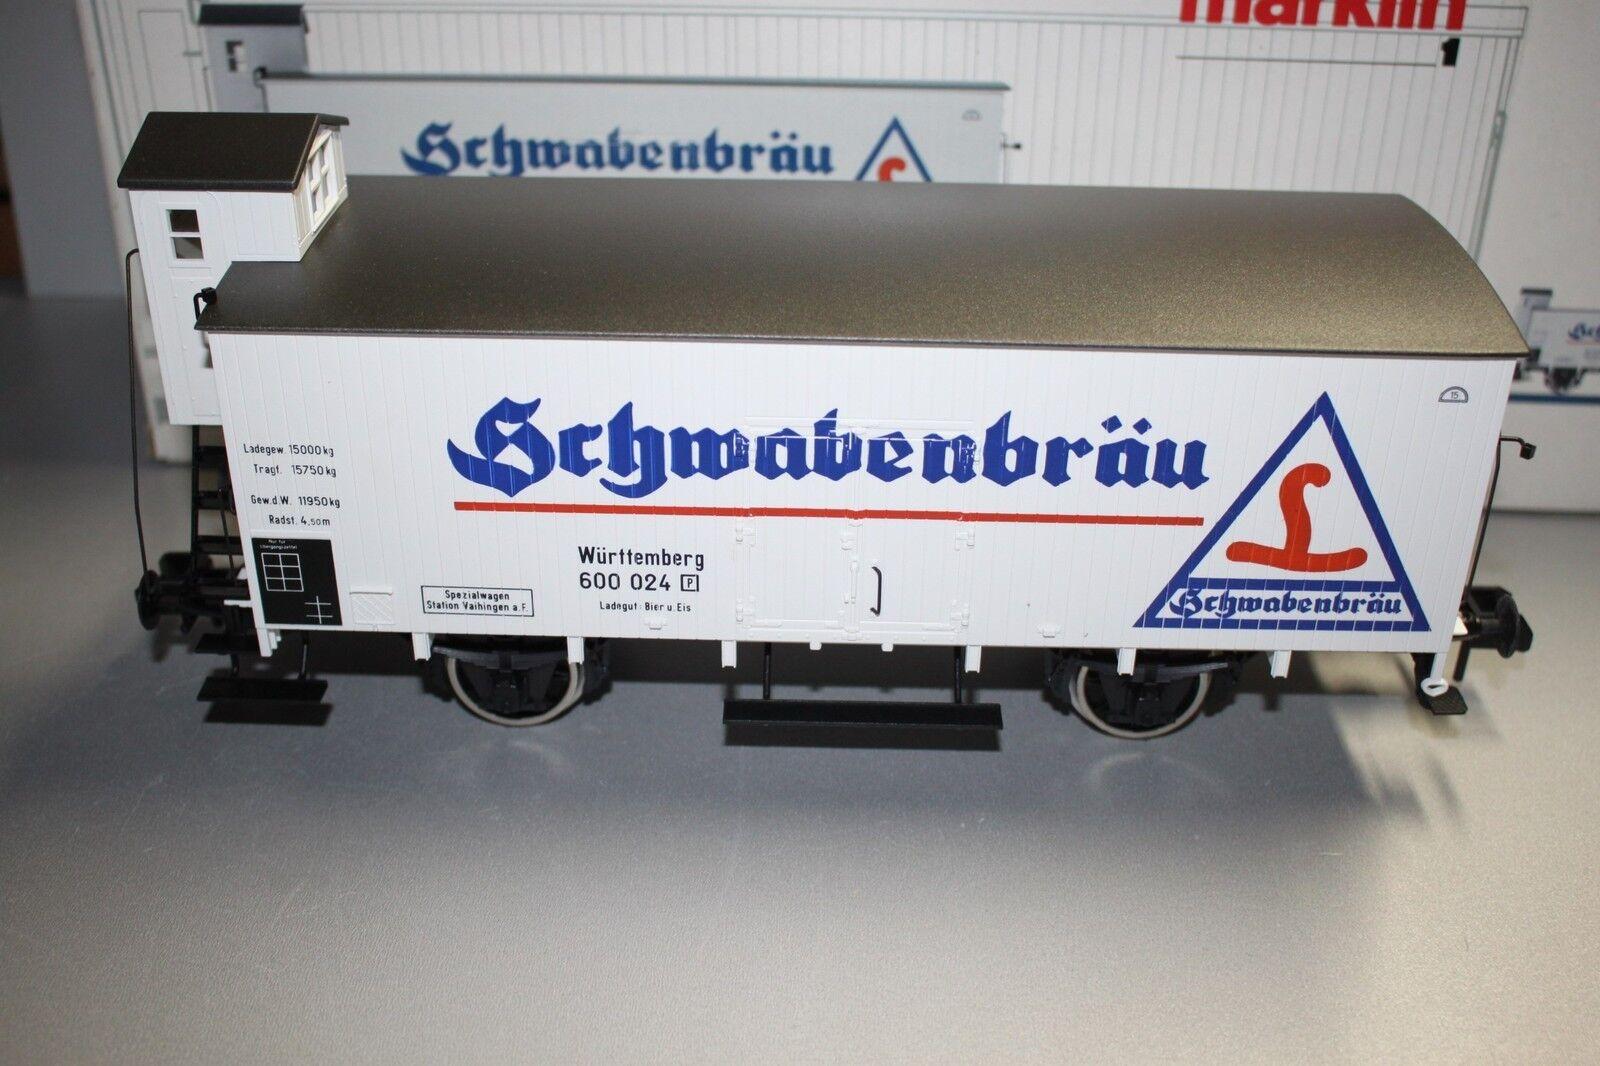 Märklin 5831 2-Achser Vagone Trasporto Birra Schwabenbräu Würtemberg Scala 1 Ovp